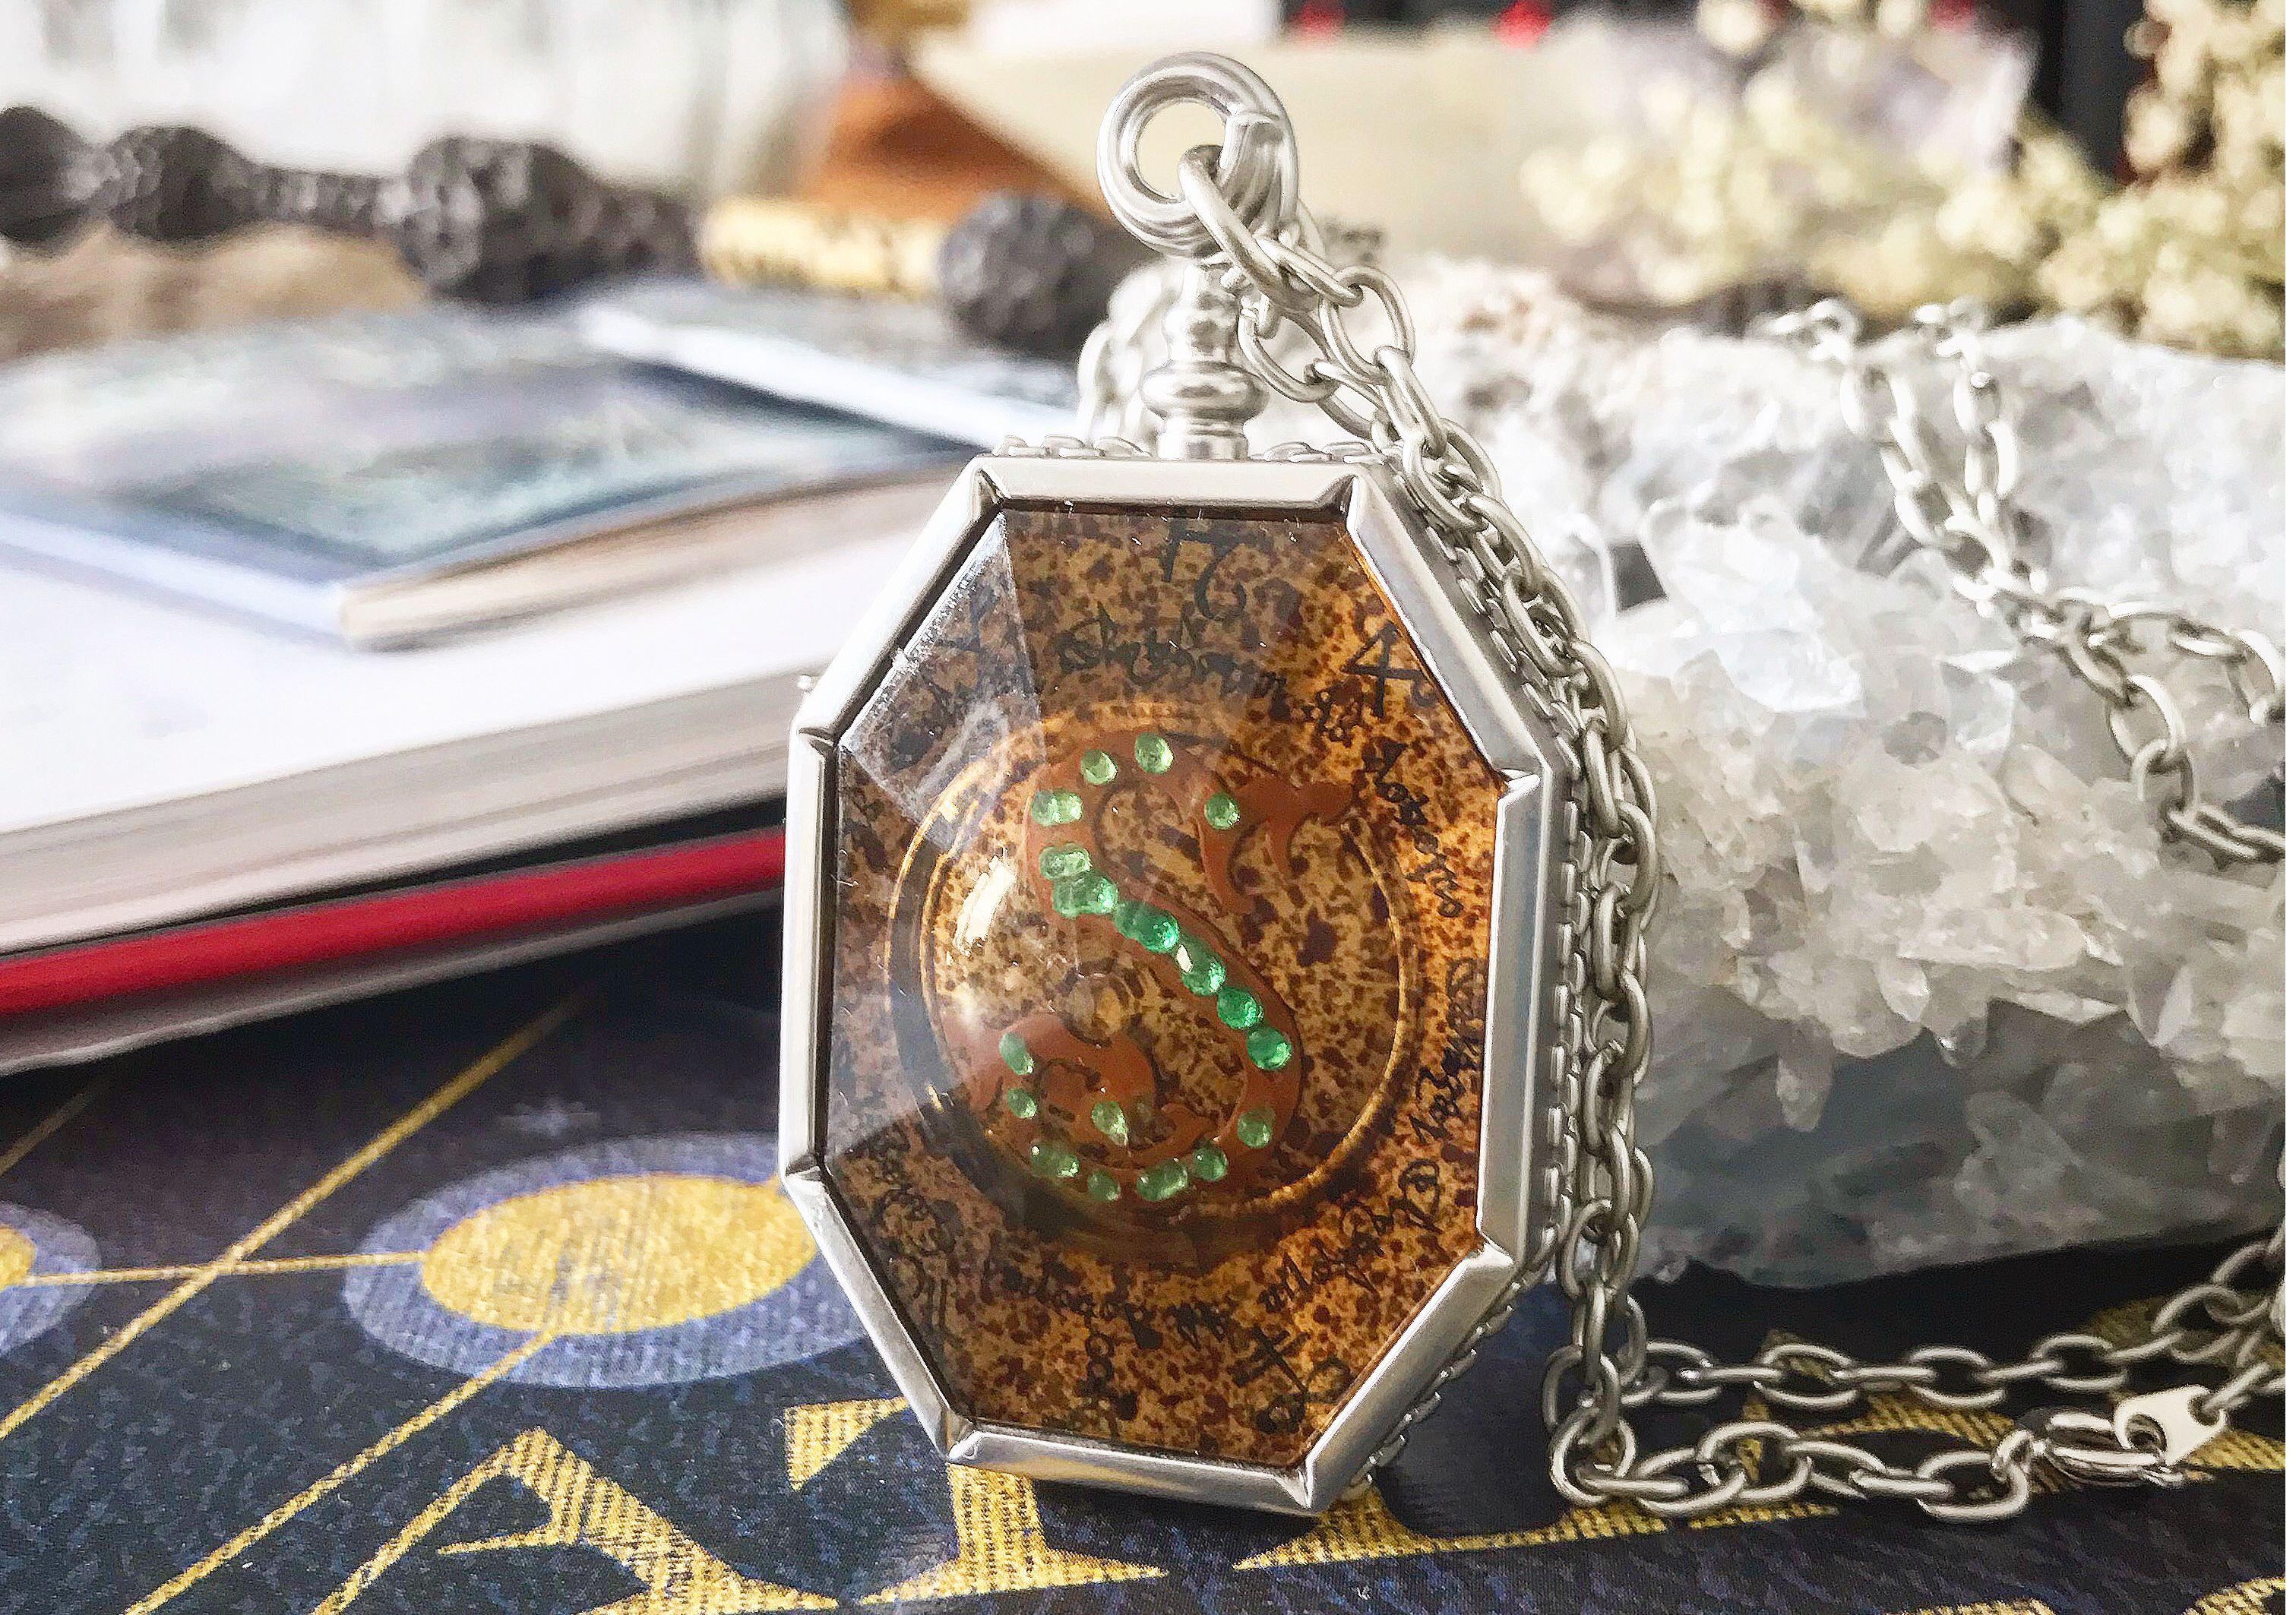 Harry-Potter-Slytherin-Medaillon-Horkrux-Replik-Noble-Collection6093e5b1aad7f